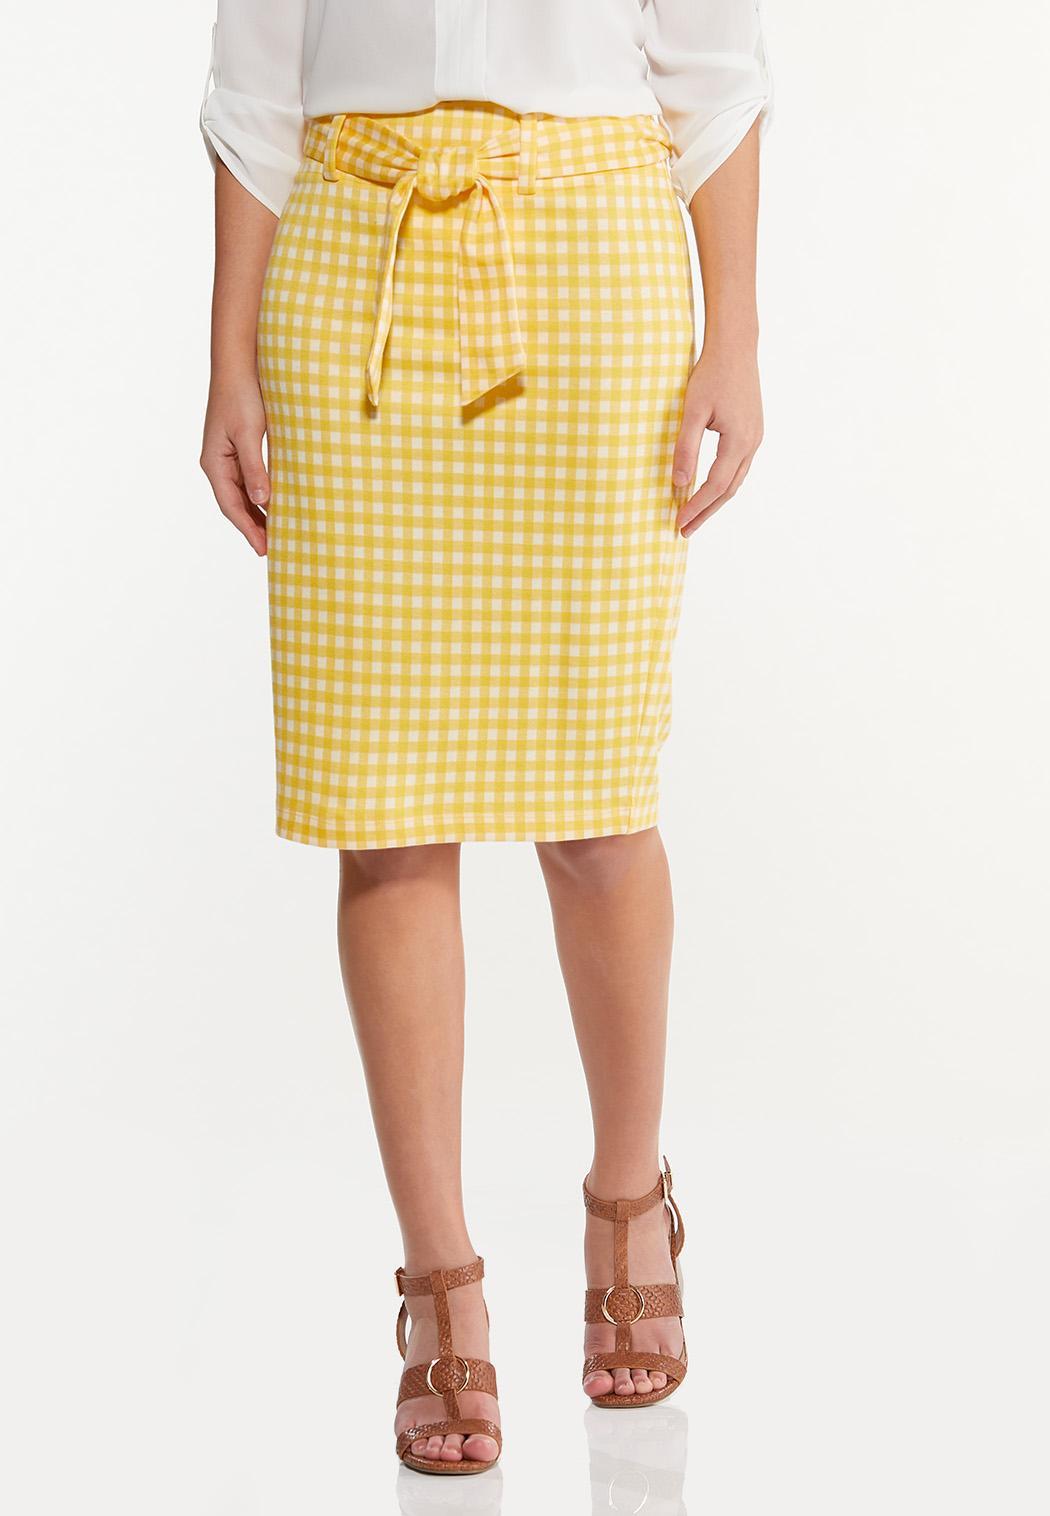 Plus Size Gold Gingham Skirt